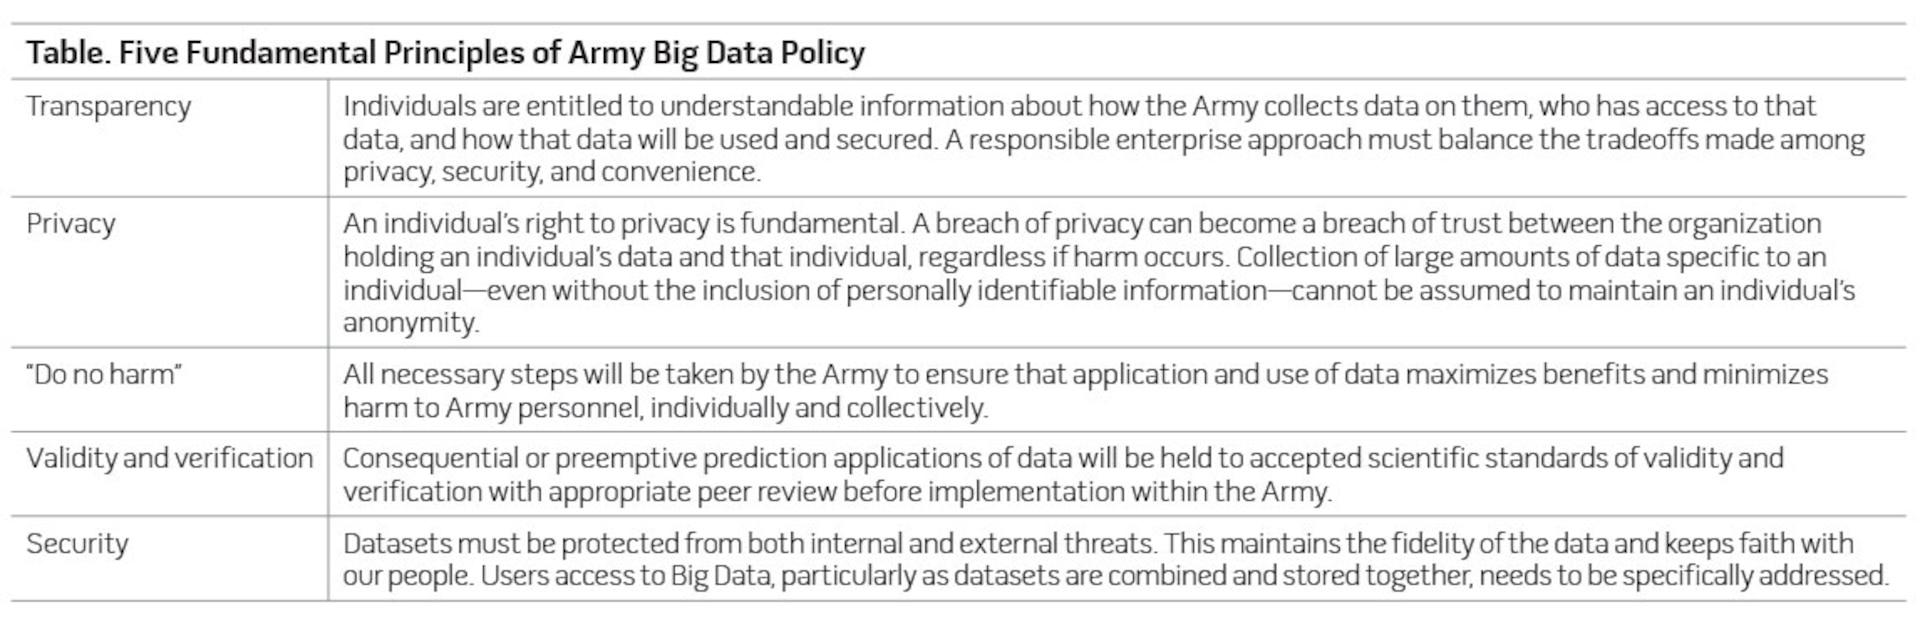 Table. Five Fundamental Principles of Army Big Data Policy